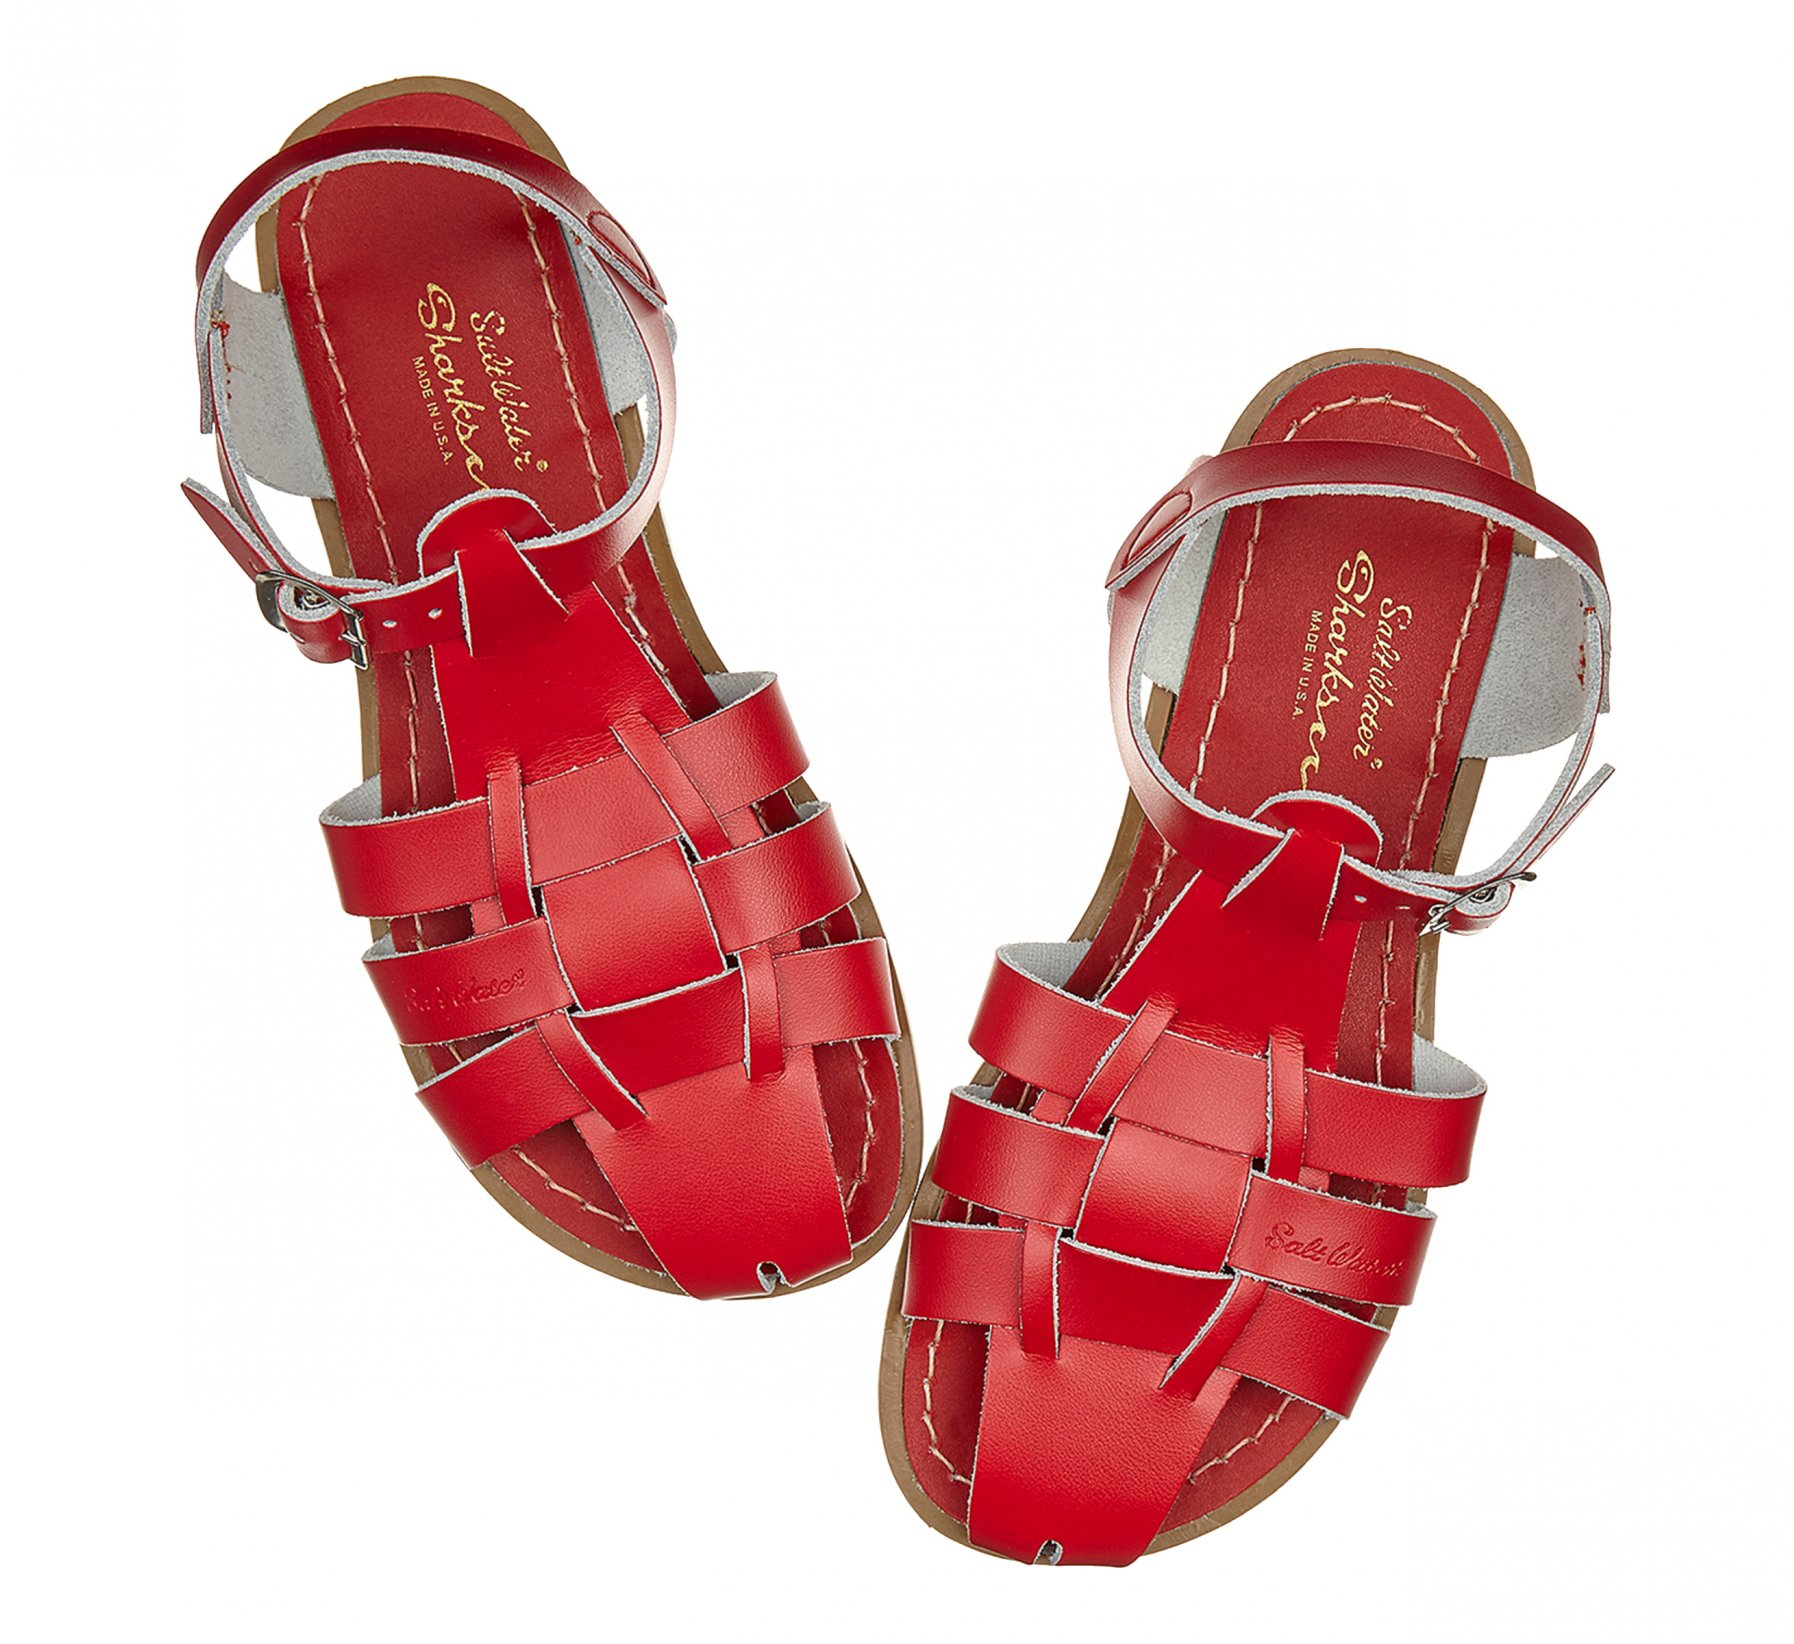 Shark Original Rouge - Salt Water Sandals